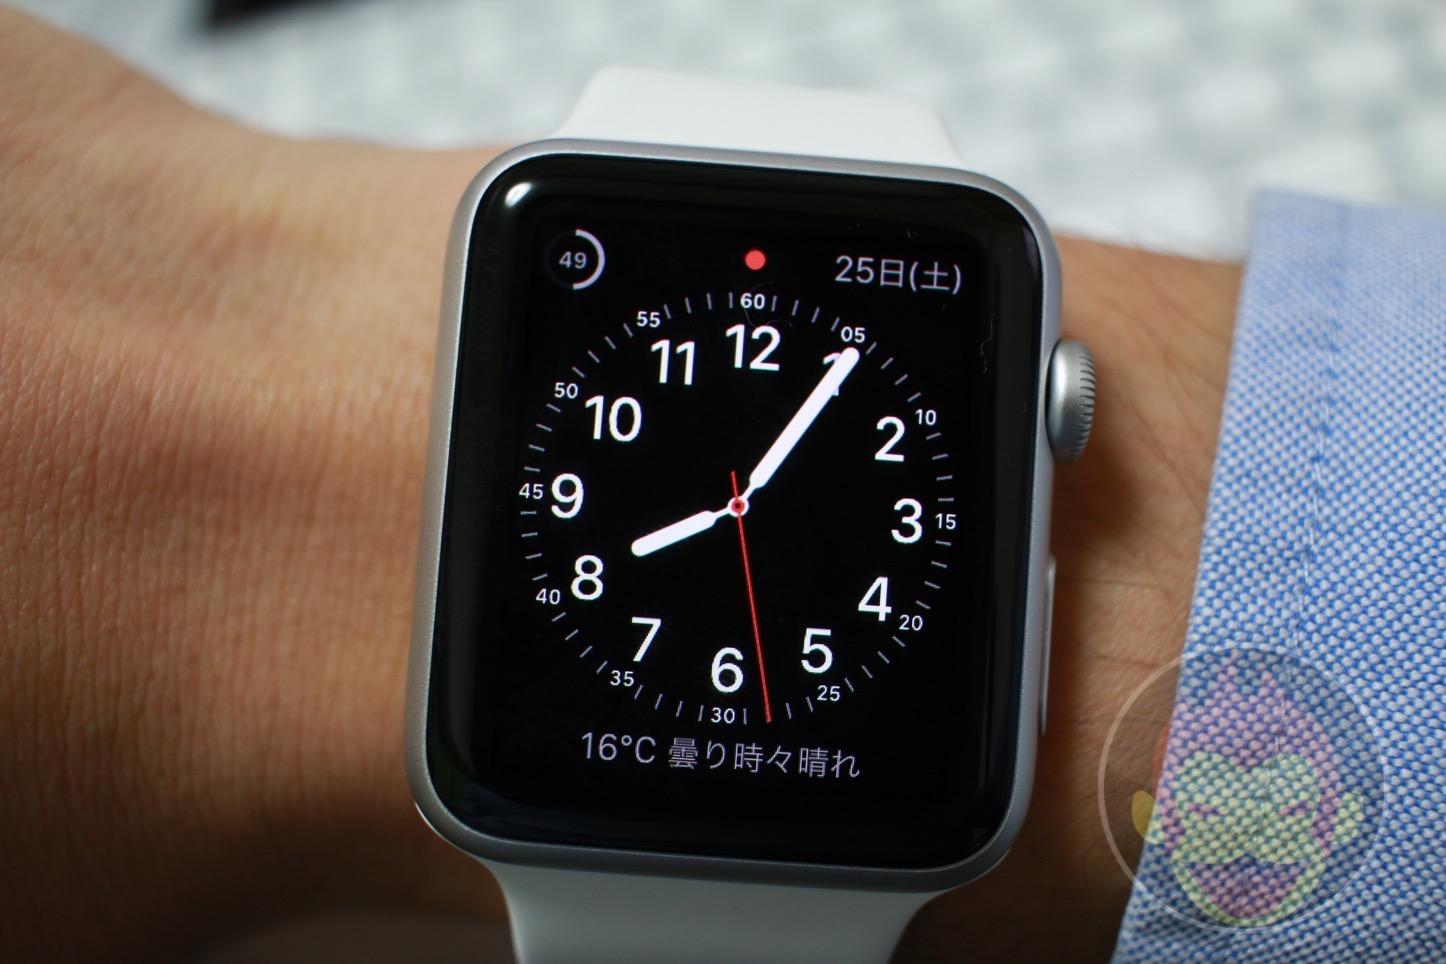 Apple-Watch-Battery-Usage-15.JPG